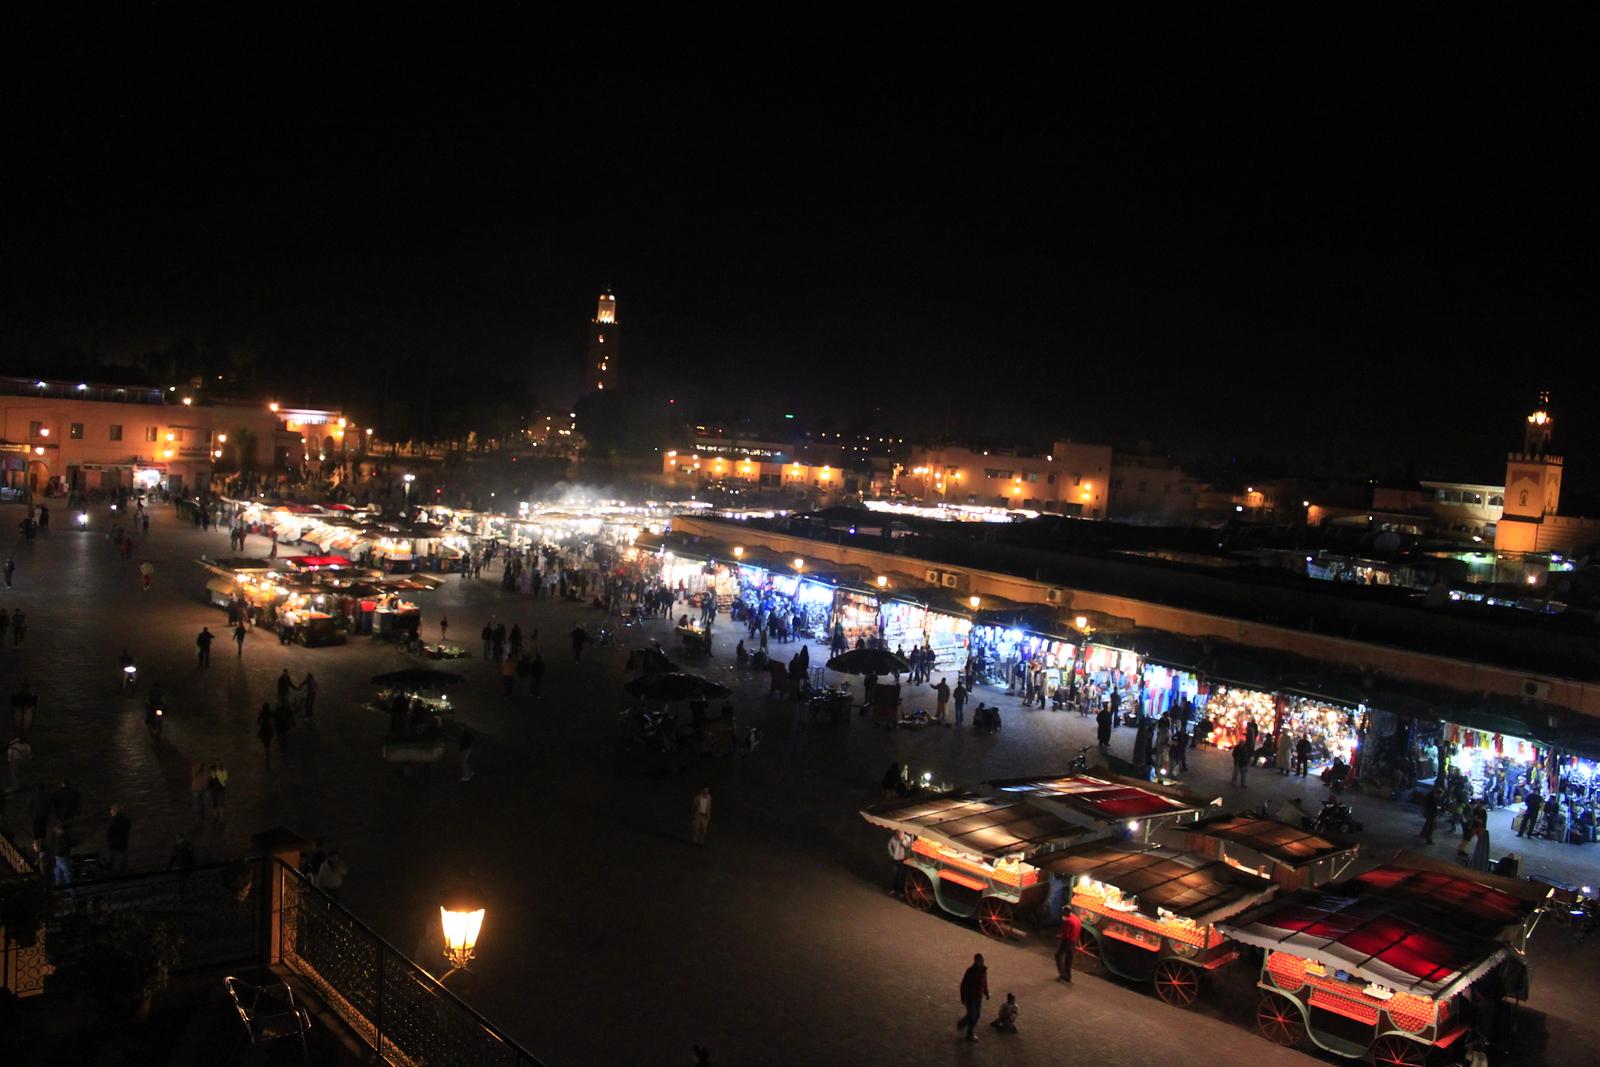 "85. Marrakech galleries<br /> - <a href=""http://www.rishisankar.com/Travel/Morocco-Maroc/Marrakech-2010-3rd-March-2010/11410459_naNy9#802185168_SMLGU"">http://www.rishisankar.com/Travel/Morocco-Maroc/Marrakech-2010-3rd-March-2010/11410459_naNy9#802185168_SMLGU</a><br /> <br /> - <a href=""http://www.rishisankar.com/Travel/Morocco-Maroc/Marrakech-2010-1st-March-2010/11386812_HBAib"">http://www.rishisankar.com/Travel/Morocco-Maroc/Marrakech-2010-1st-March-2010/11386812_HBAib</a><br /> <br /> - <a href=""http://www.rishisankar.com/Travel/Morocco-Maroc/Marrakech-2010-2nd-March-2010/11402576_bfHhg"">http://www.rishisankar.com/Travel/Morocco-Maroc/Marrakech-2010-2nd-March-2010/11402576_bfHhg</a> <br /> <br /> <br /> <br /> Hillman Wonders page : <a href=""http://www.hillmanwonders.com/marrakesh/marrakesh.htm"">http://www.hillmanwonders.com/marrakesh/marrakesh.htm</a>"